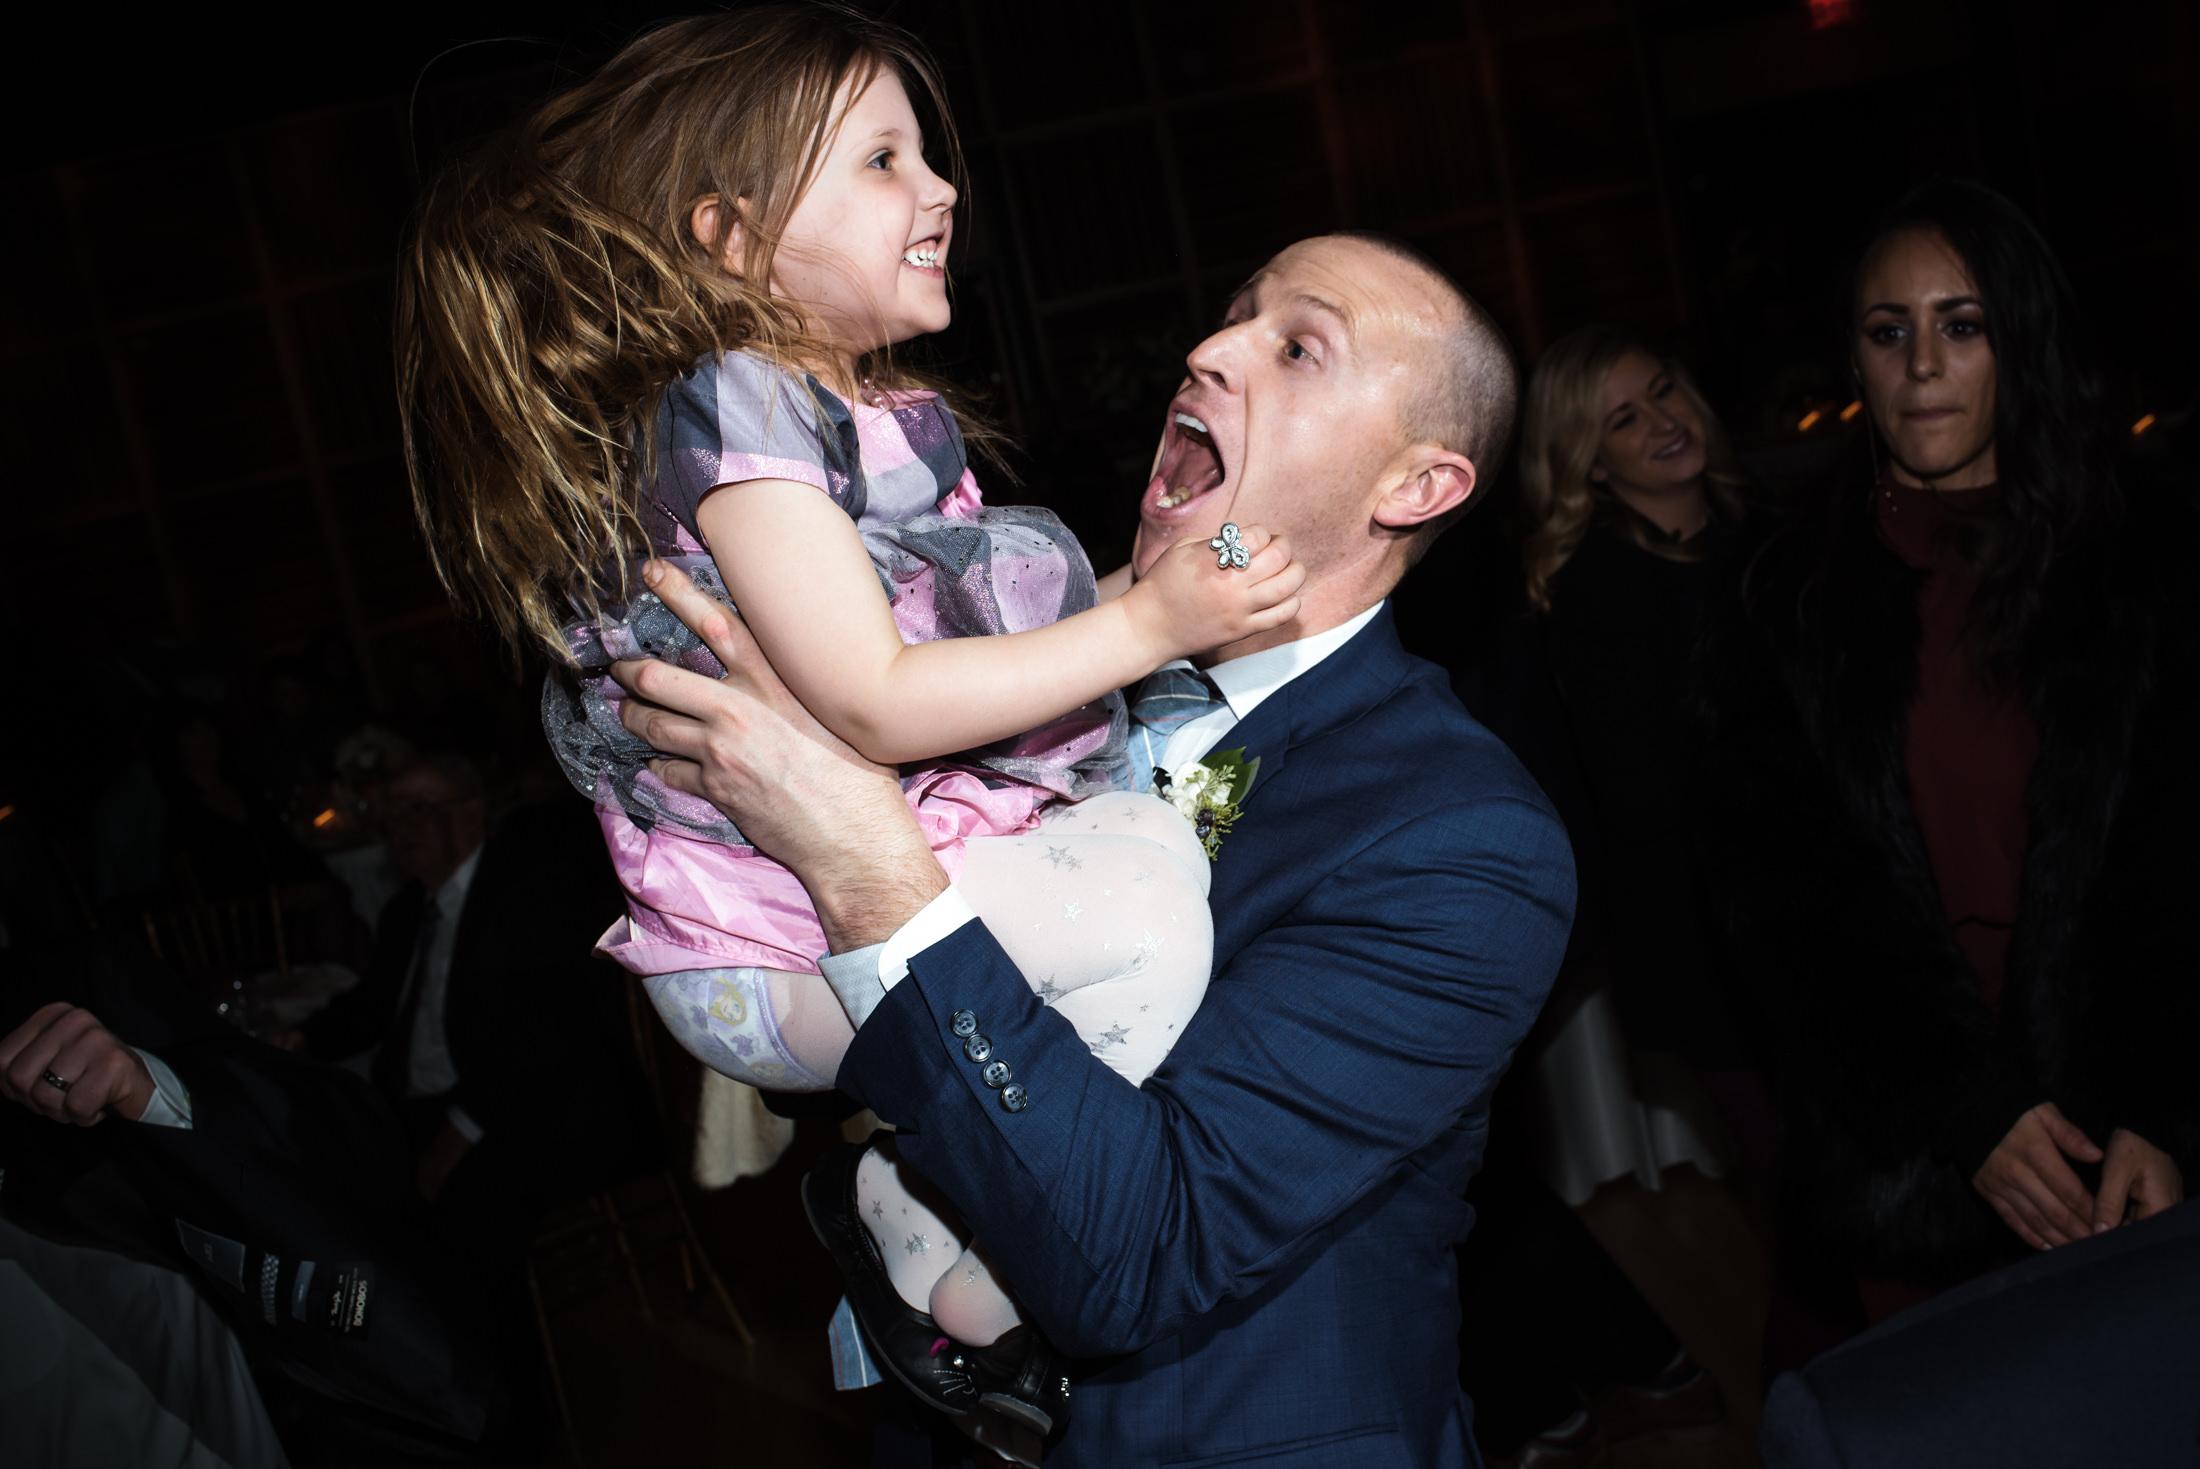 holland-center-reception-omaha-wedding-photographer-0009.JPG